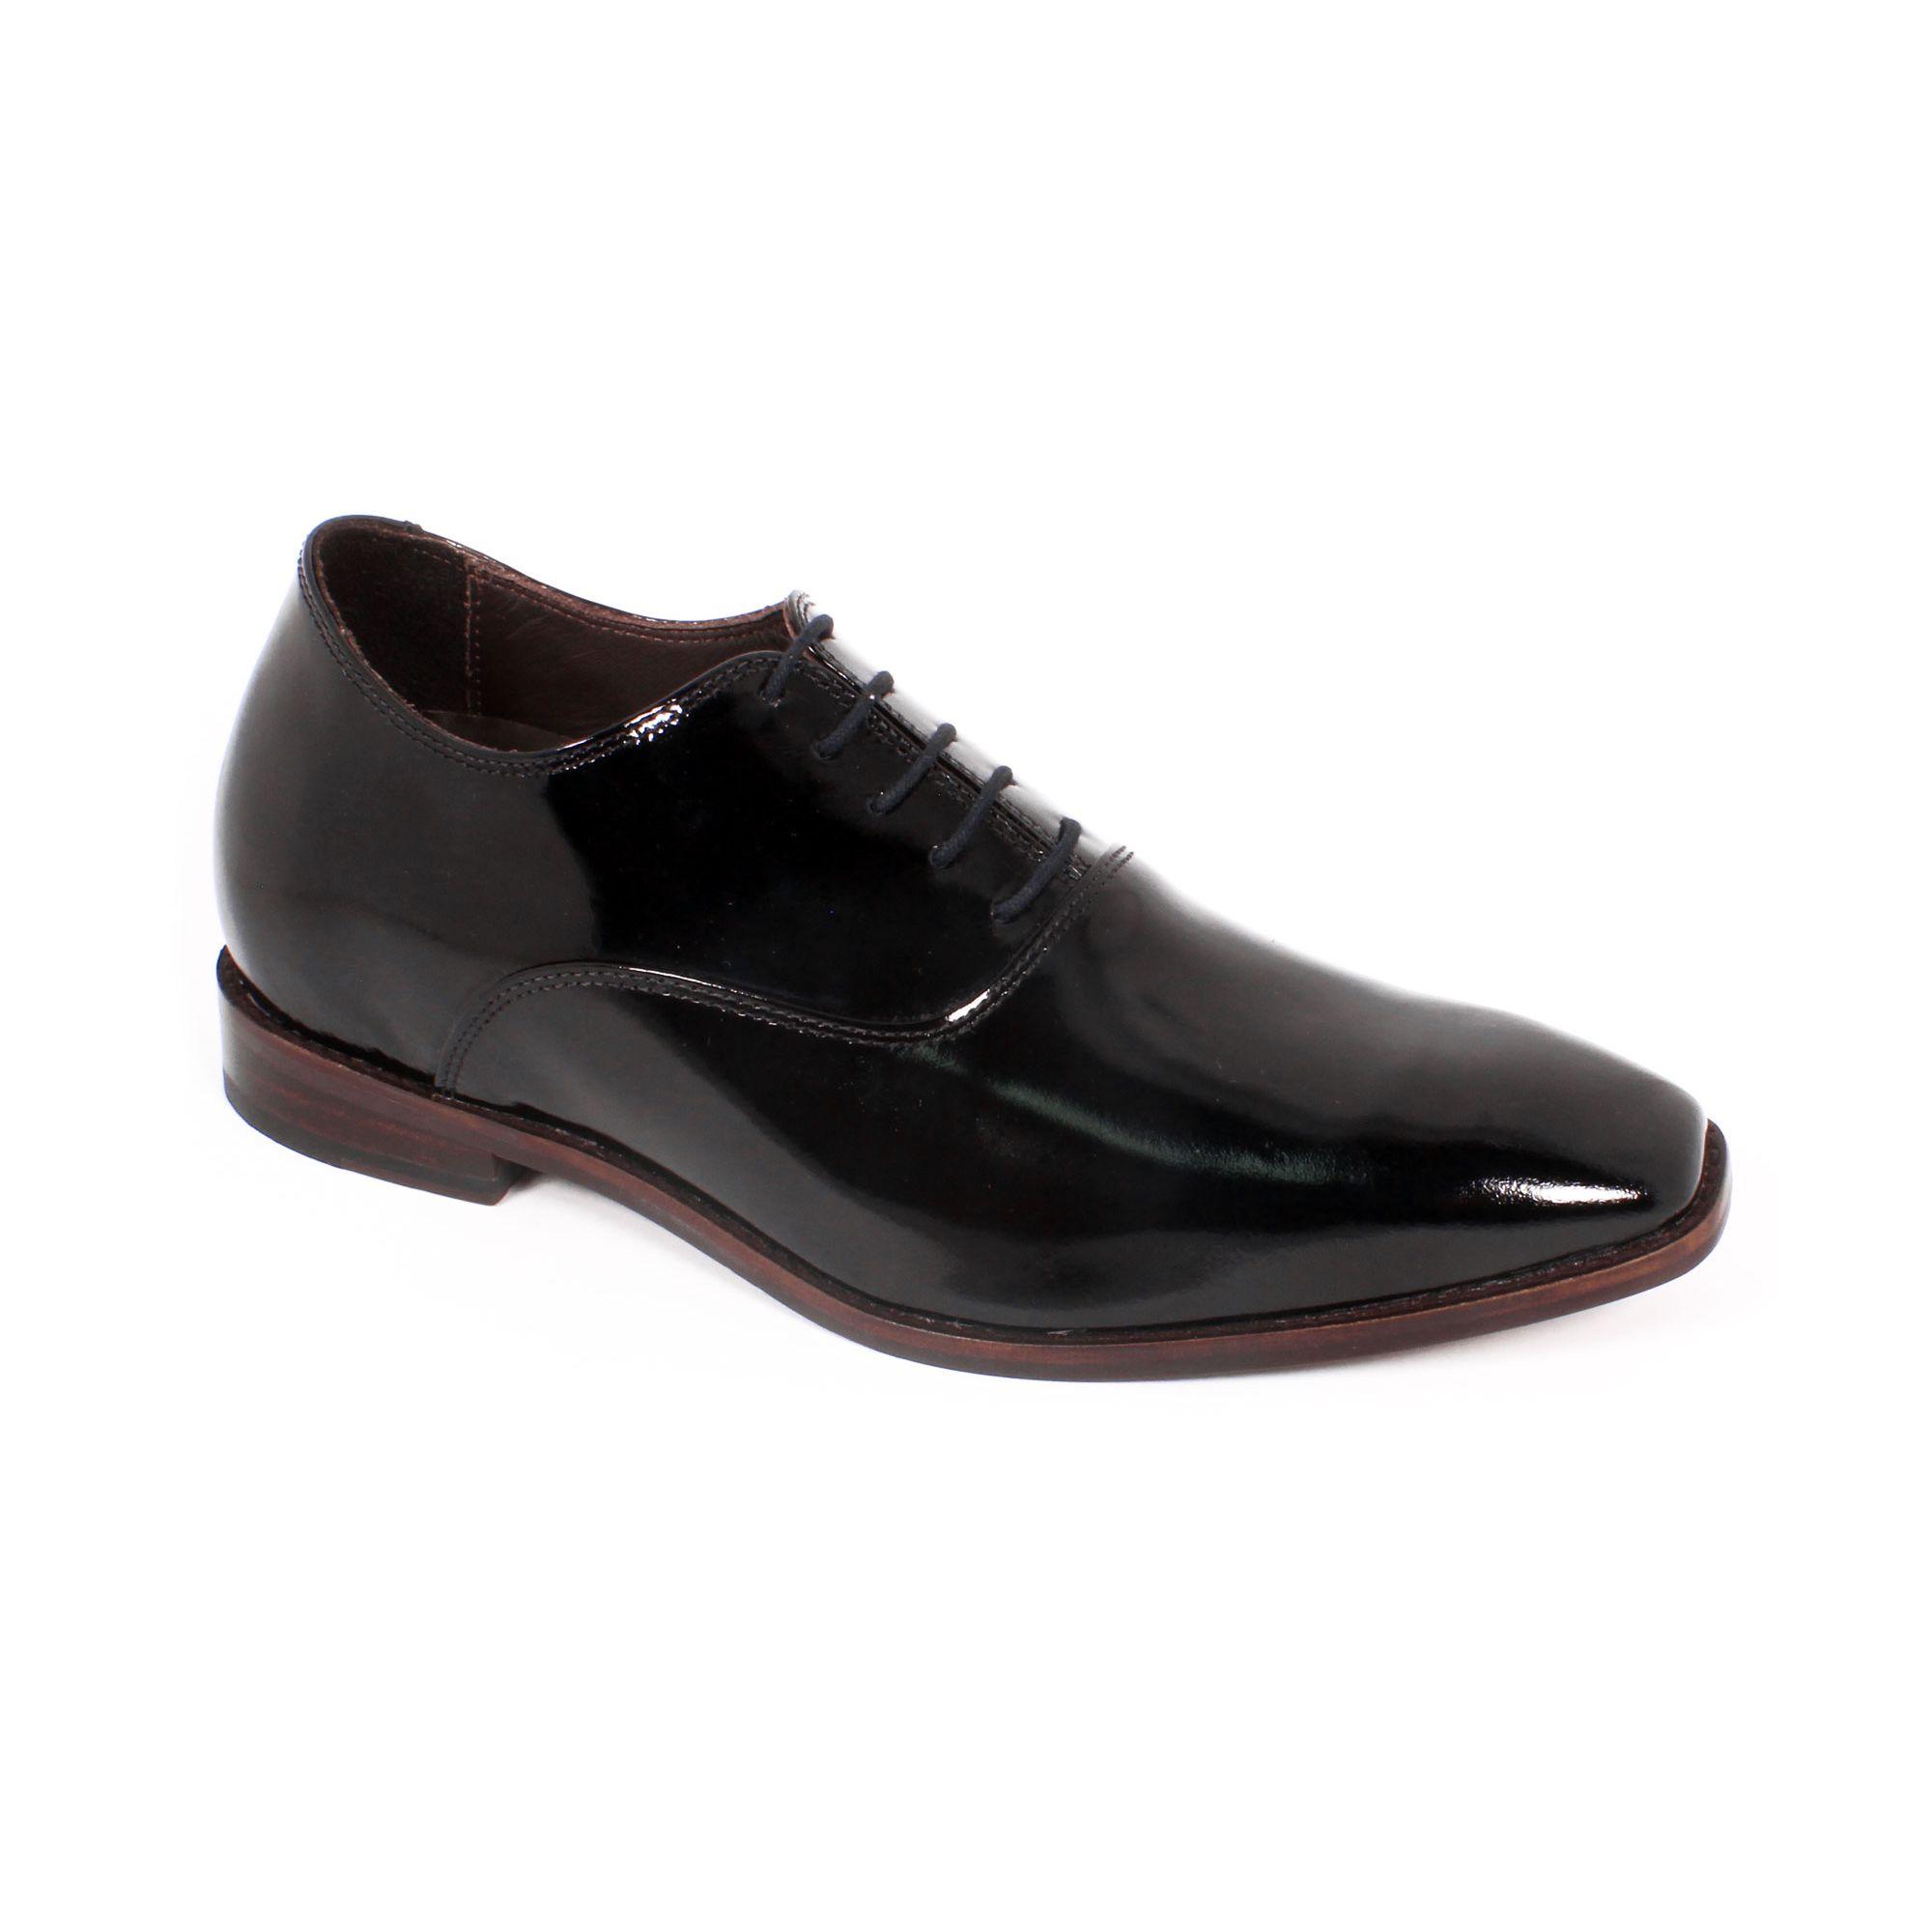 Zapato Formal Elegant Charol Negro Max Denegri +7cm de Altura_70810